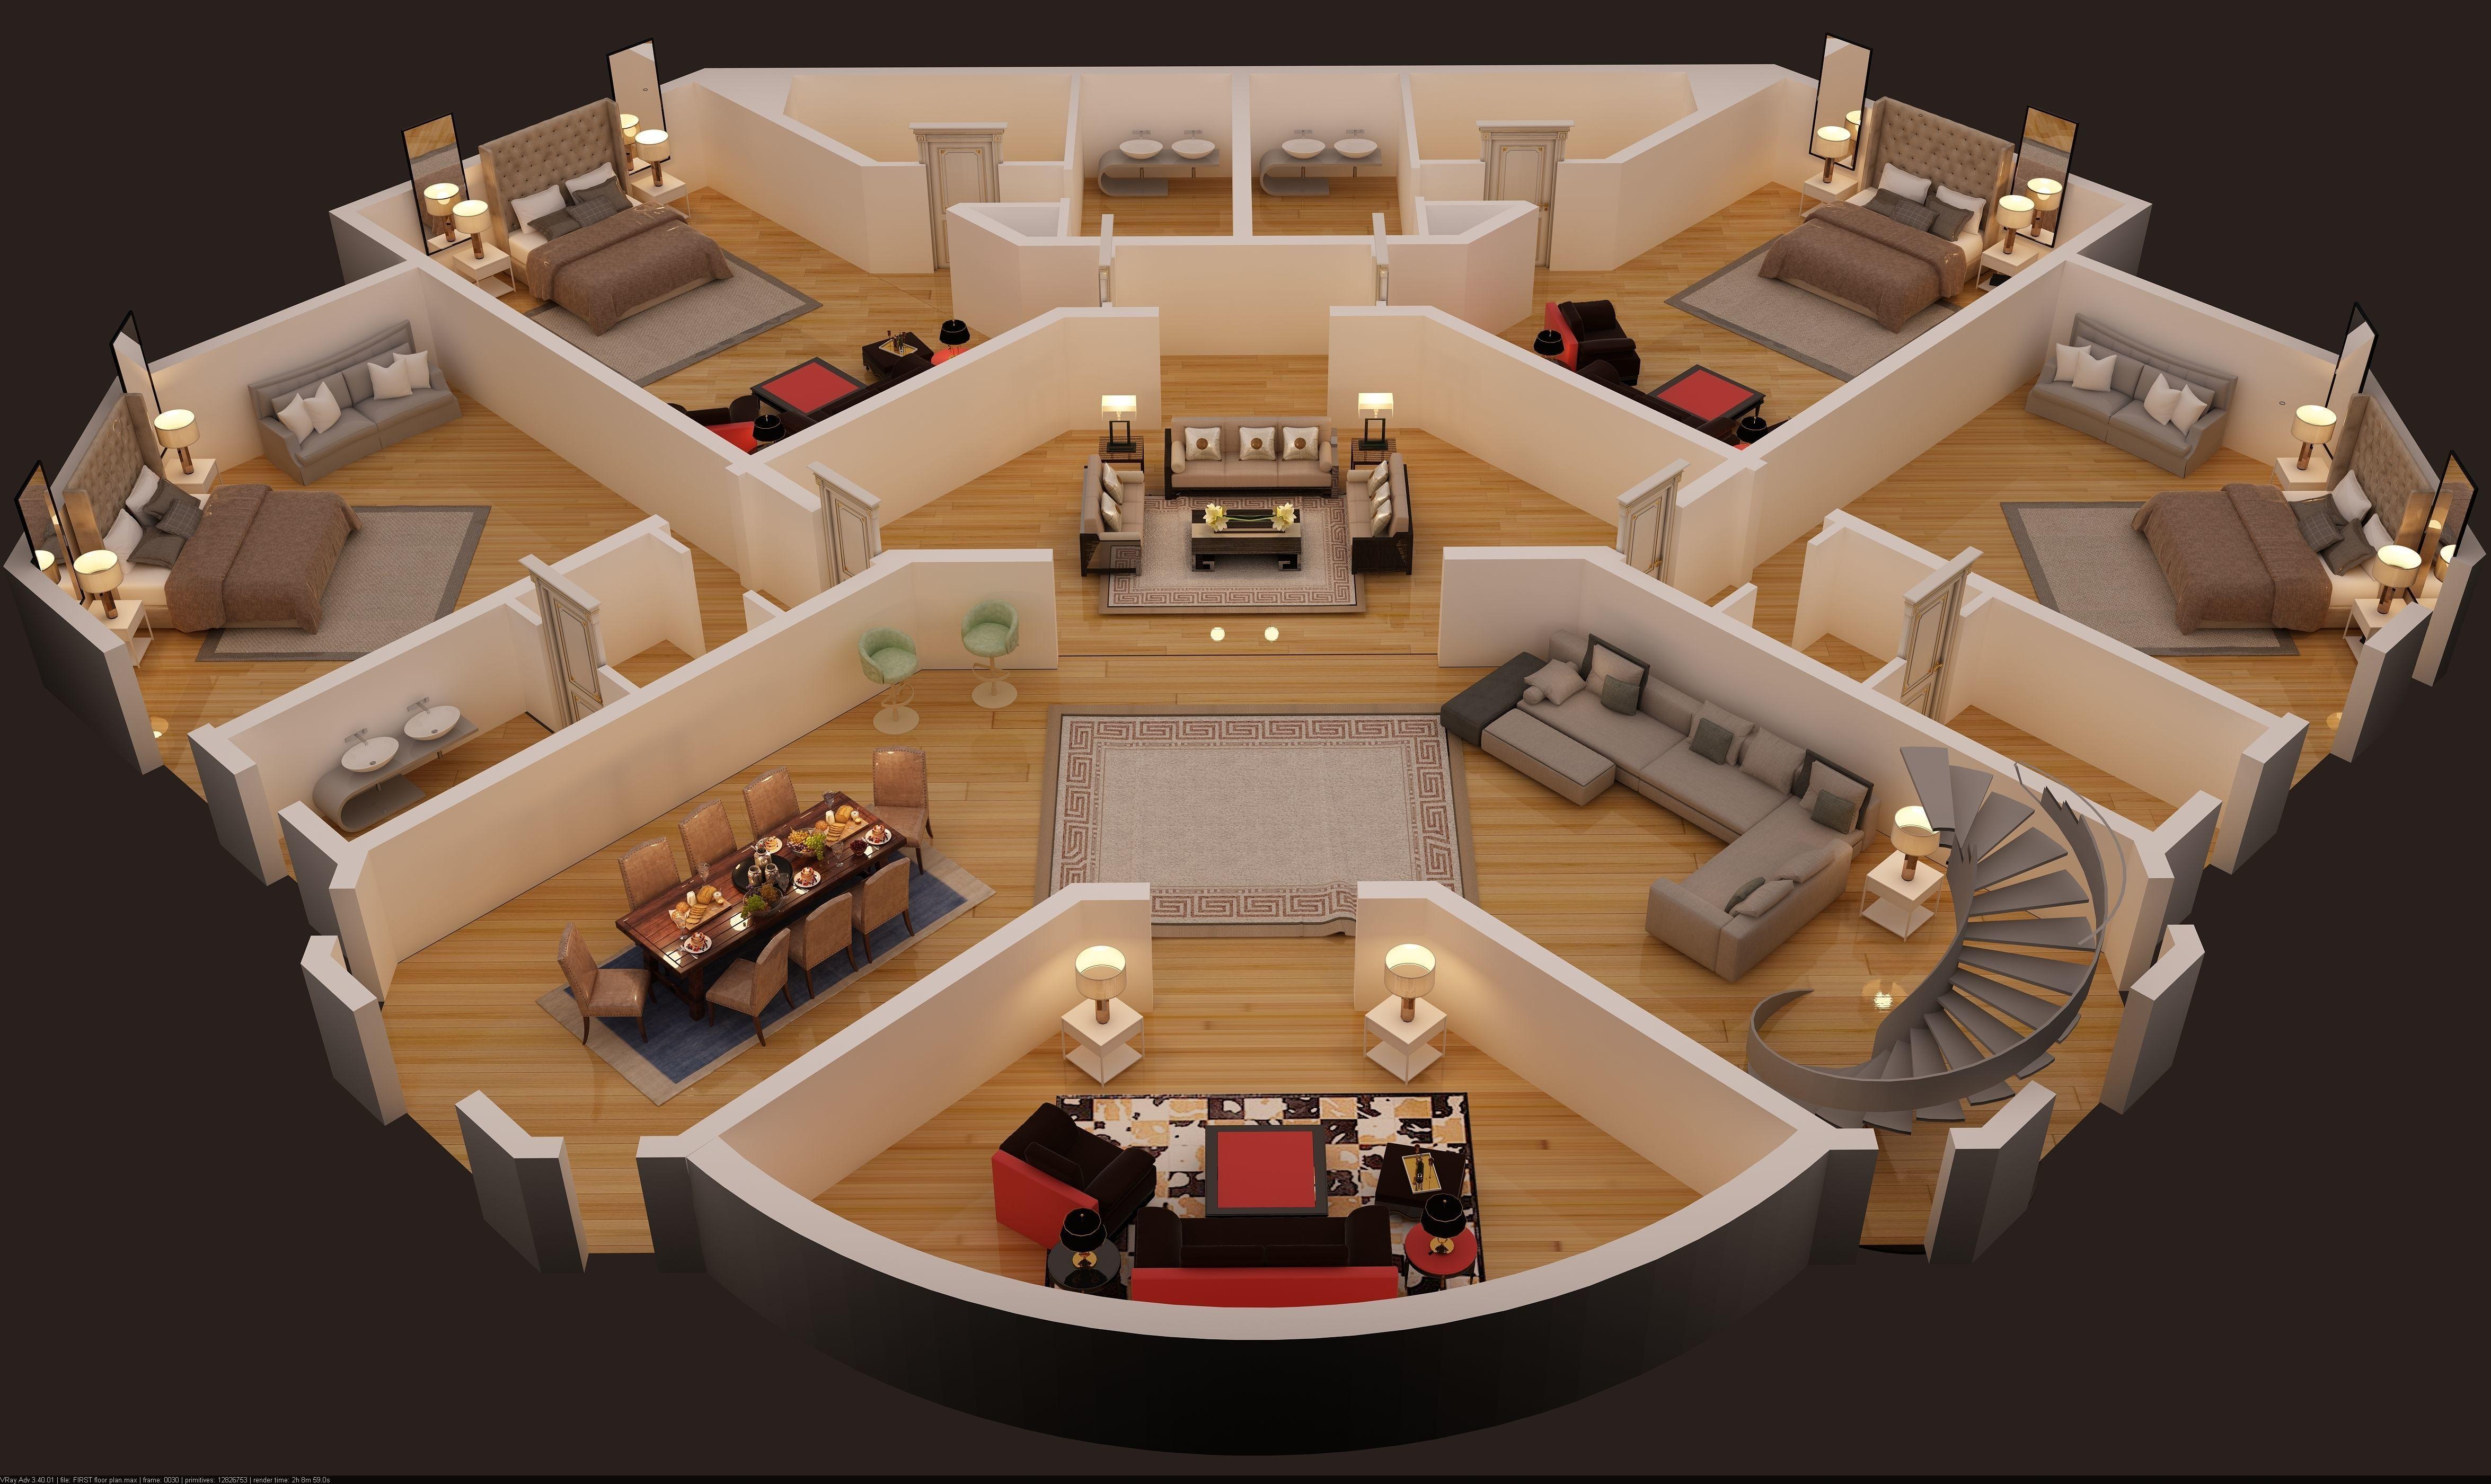 3d floor plan of first floor luxury house | CGTrader ...